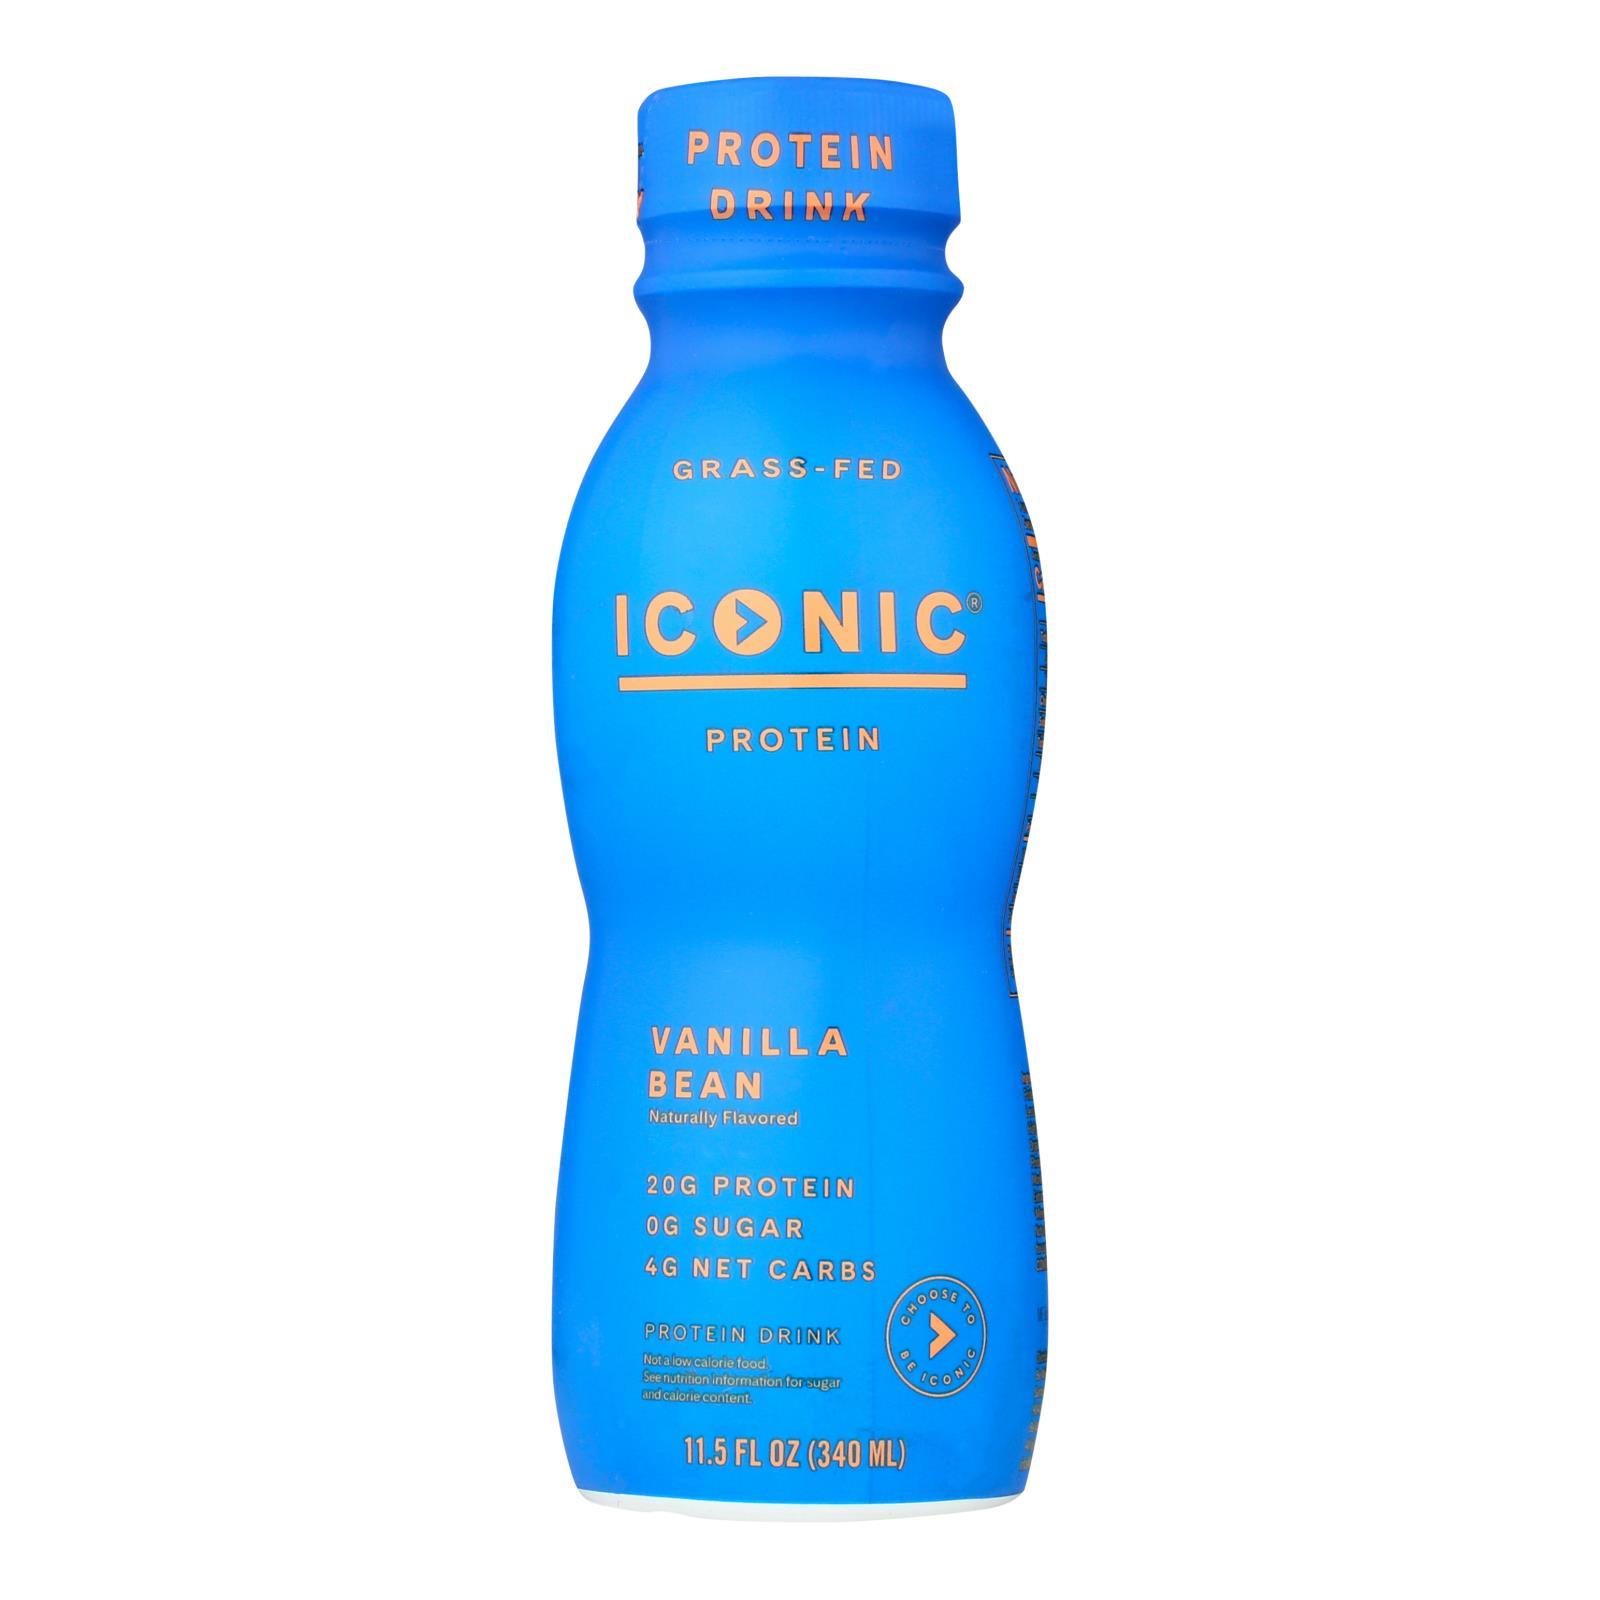 Iconic Protein Shake - Vanilla Bean - Case of 12 - 11.5 Fl oz.